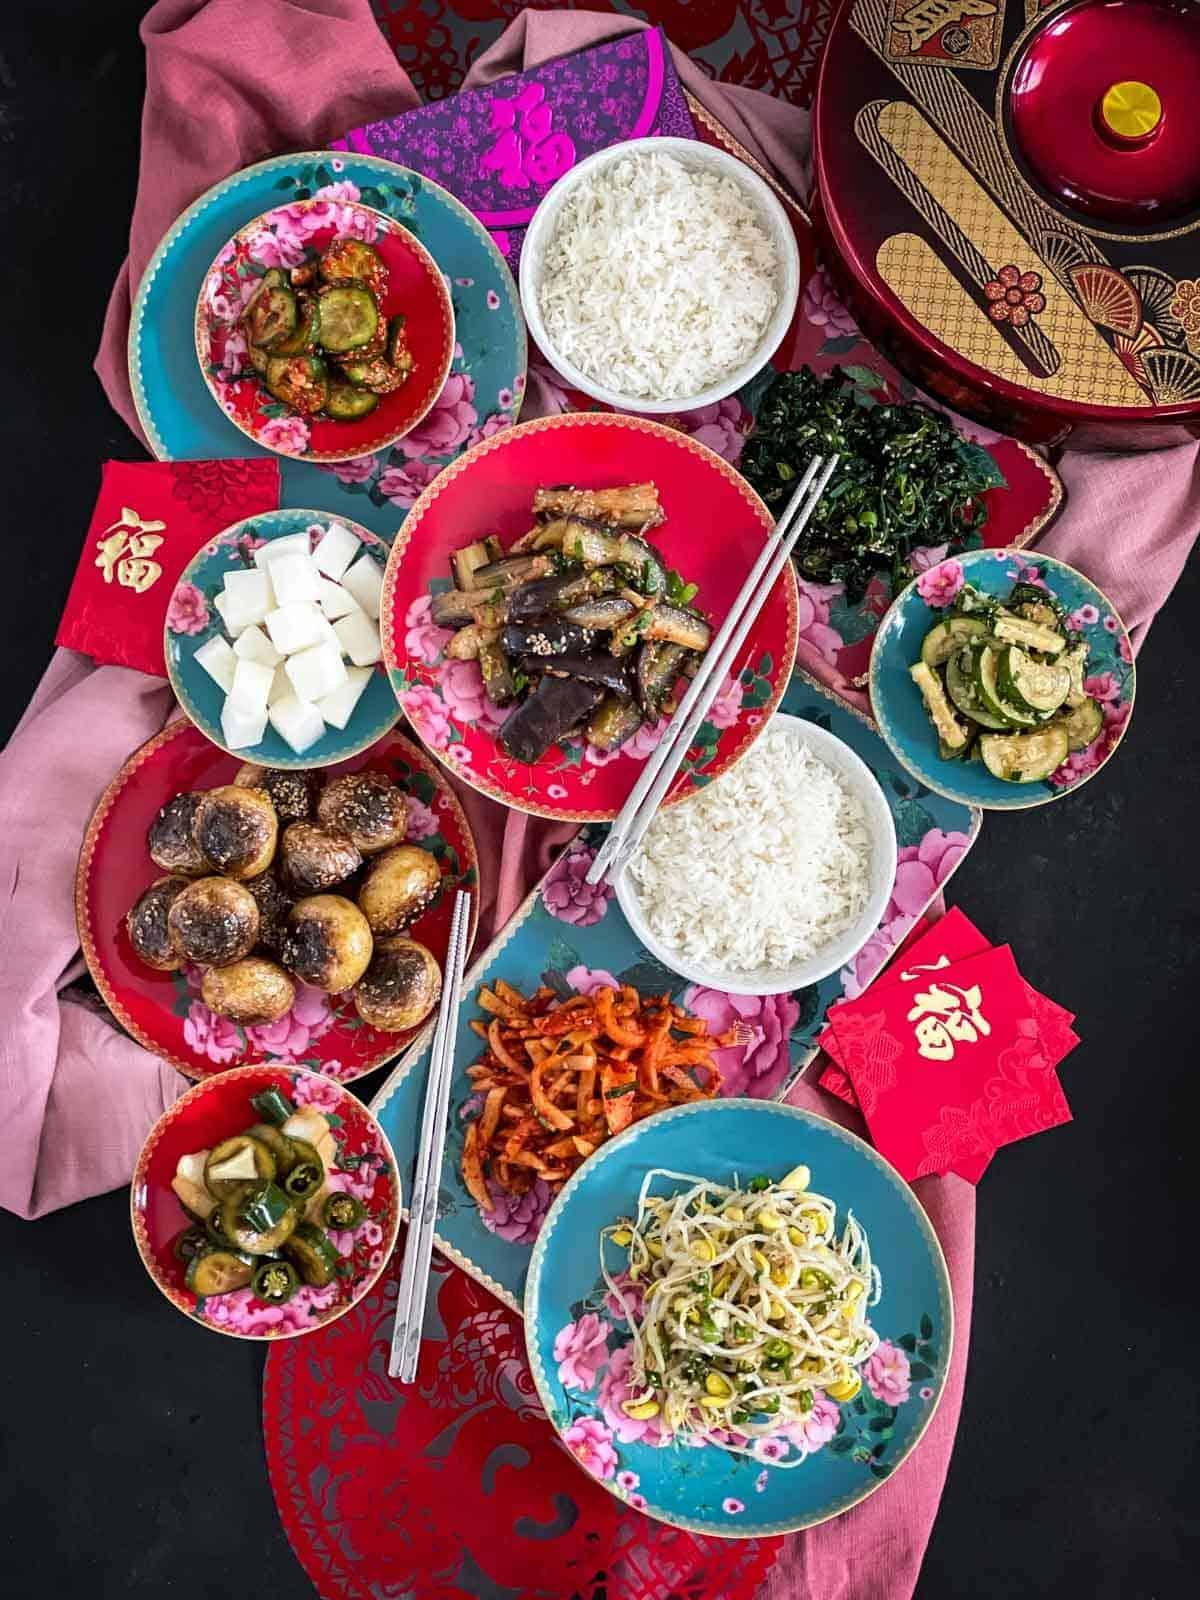 Korean Side Dishes Recipes - Banchan